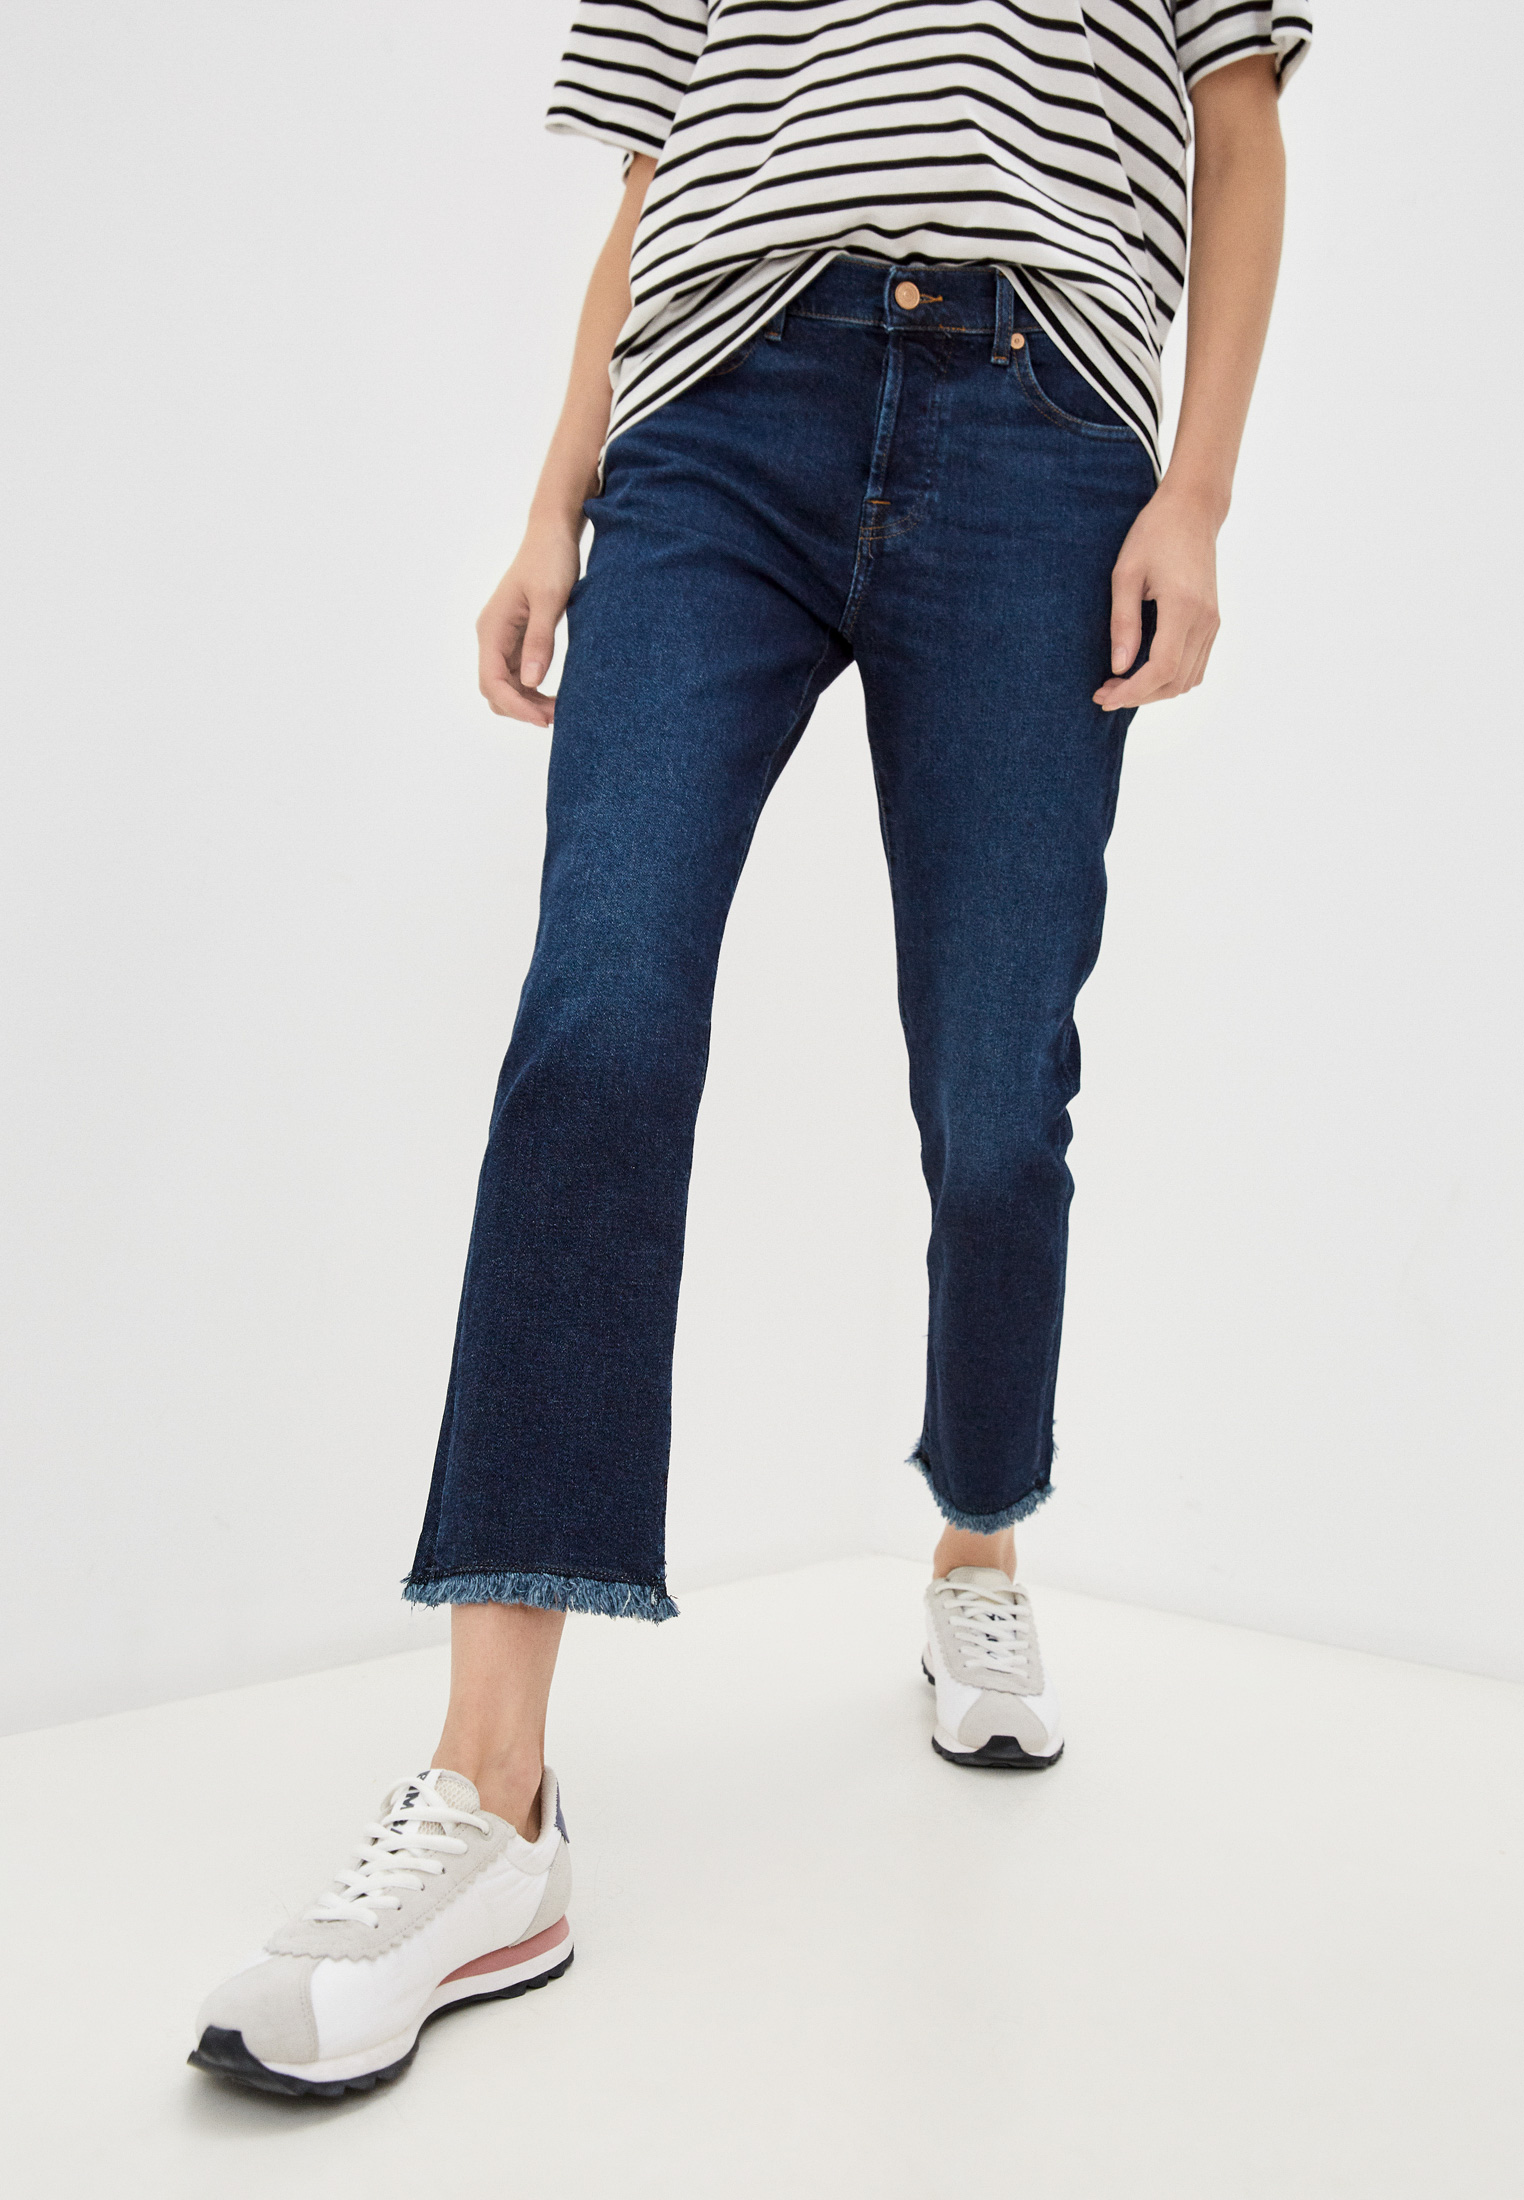 Зауженные джинсы 7 For All Mankind (7 Фо Олл Мэнкайнд) JSDSA910VH: изображение 1